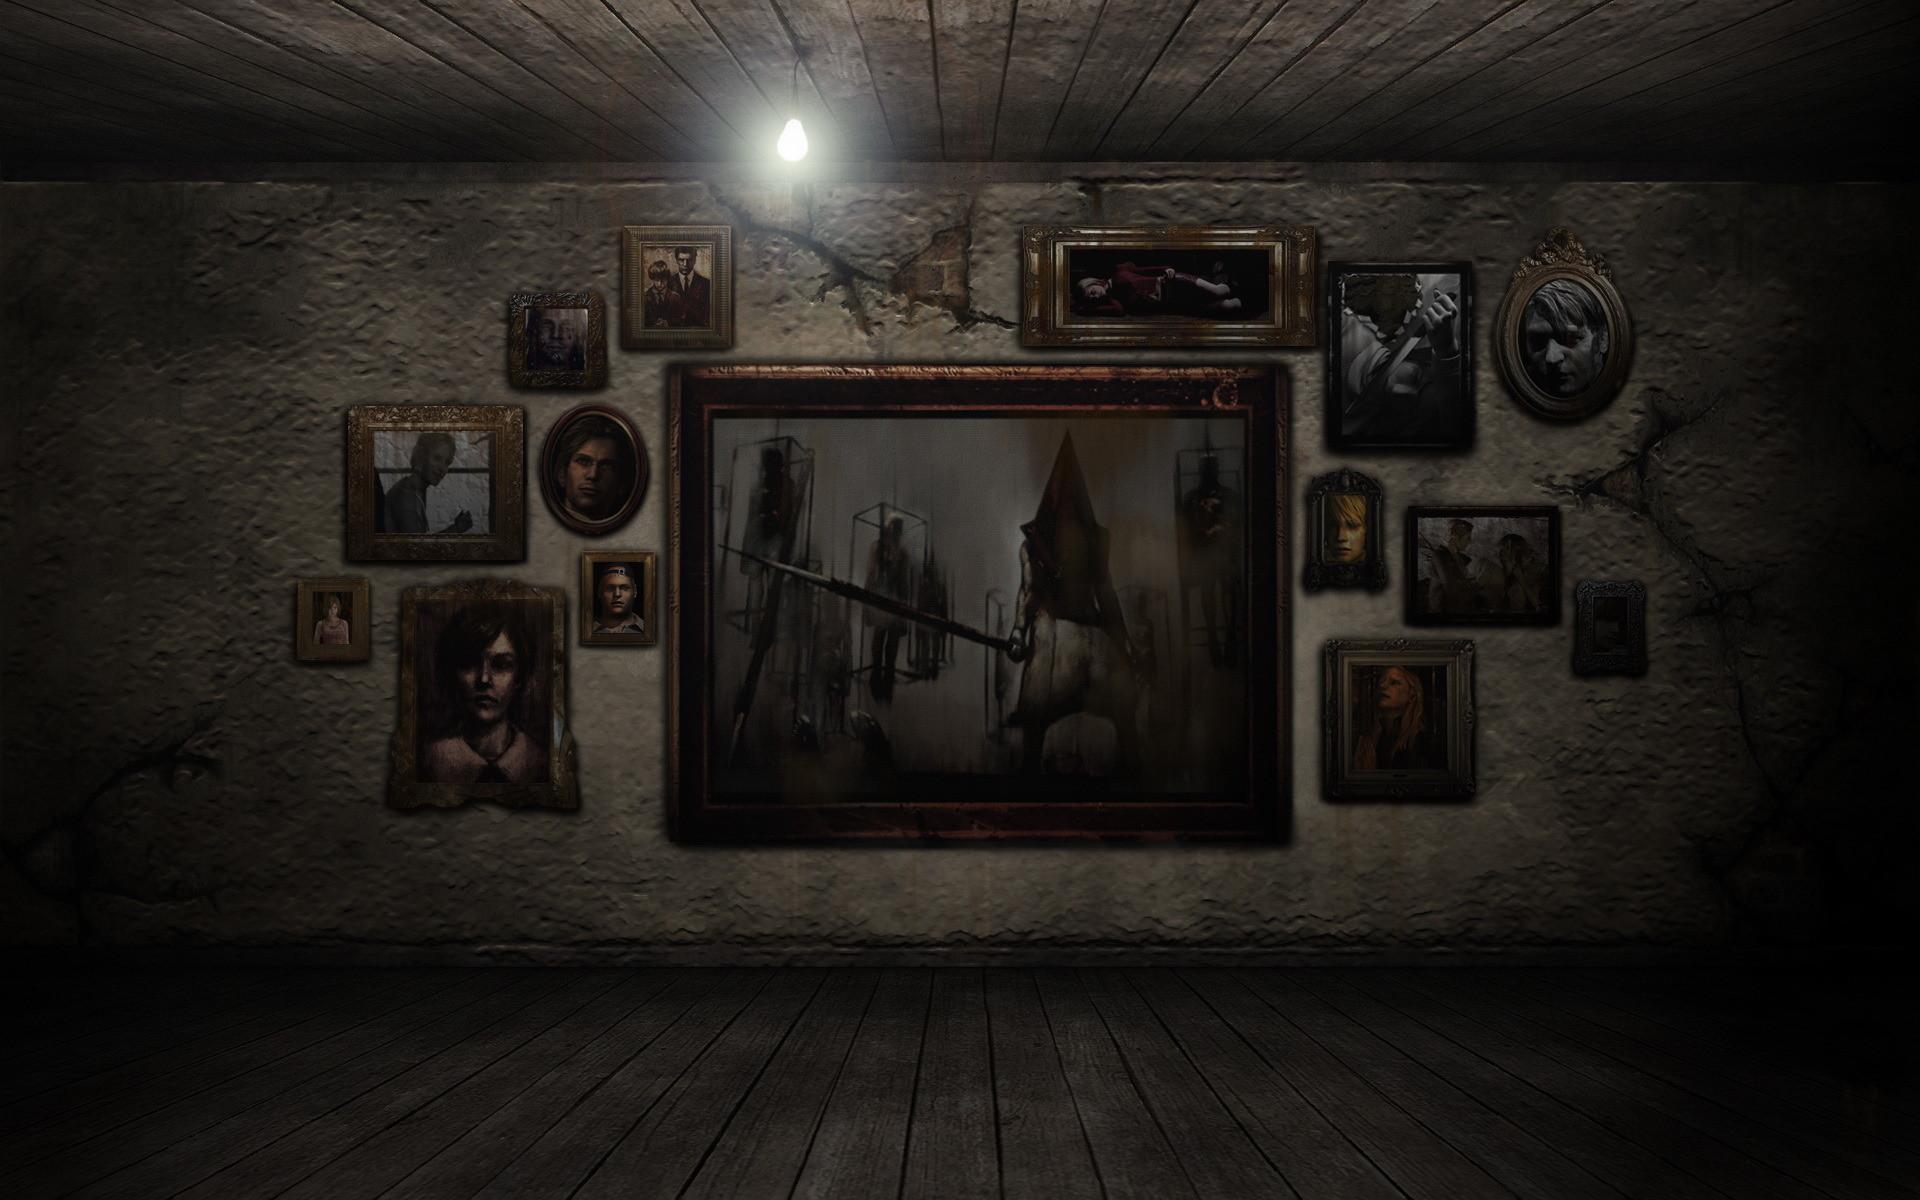 Silent Hill Wallpapers | WallpapersIn4k.net